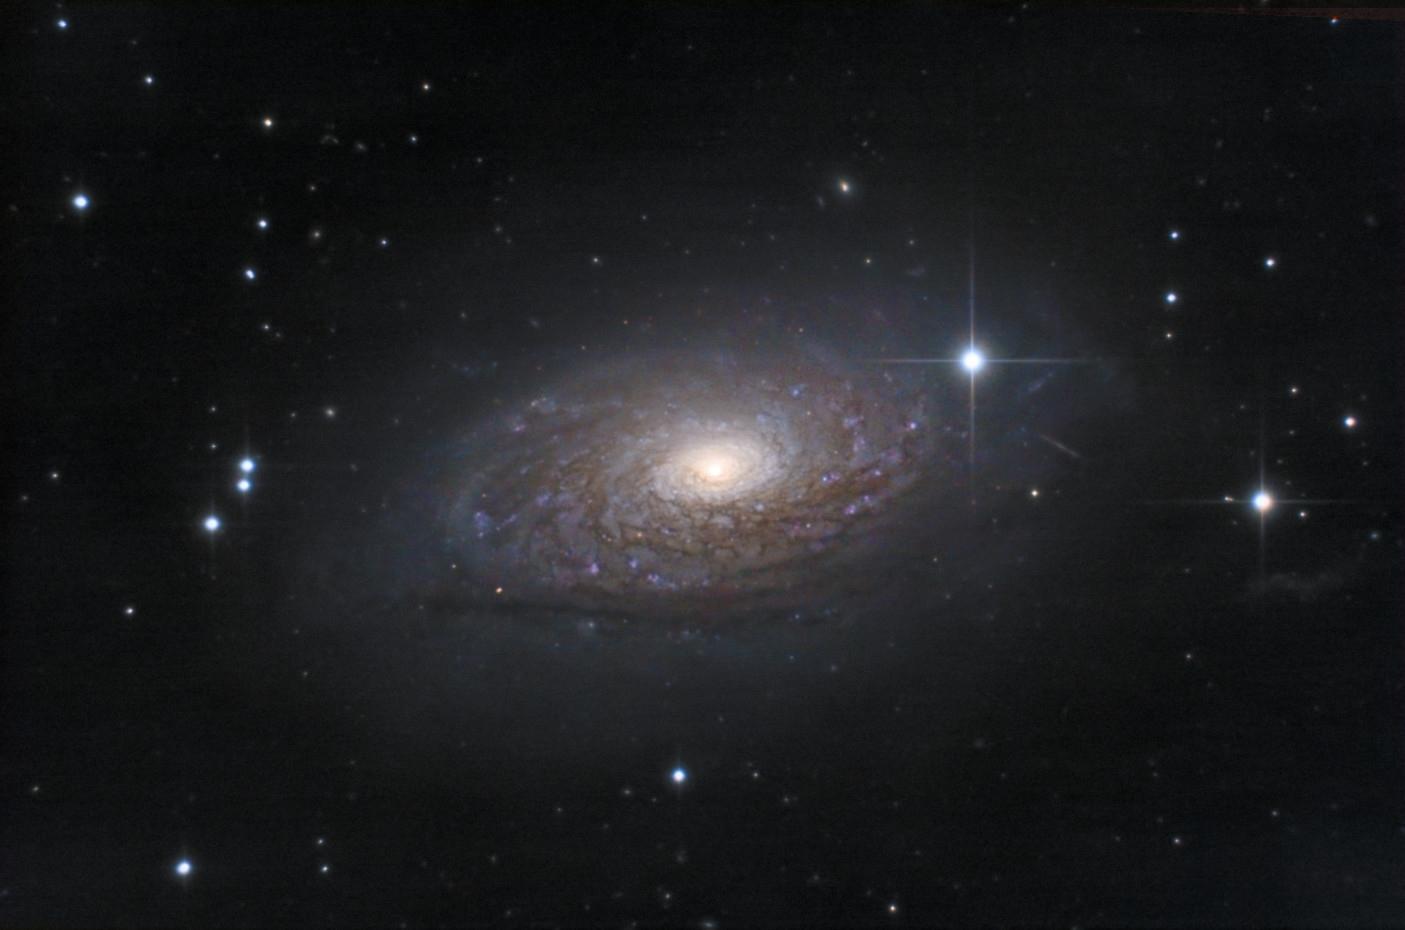 Marathon galactique: m63 m101 ngc3079 ngc3344 ngc4565 122643-1585649480